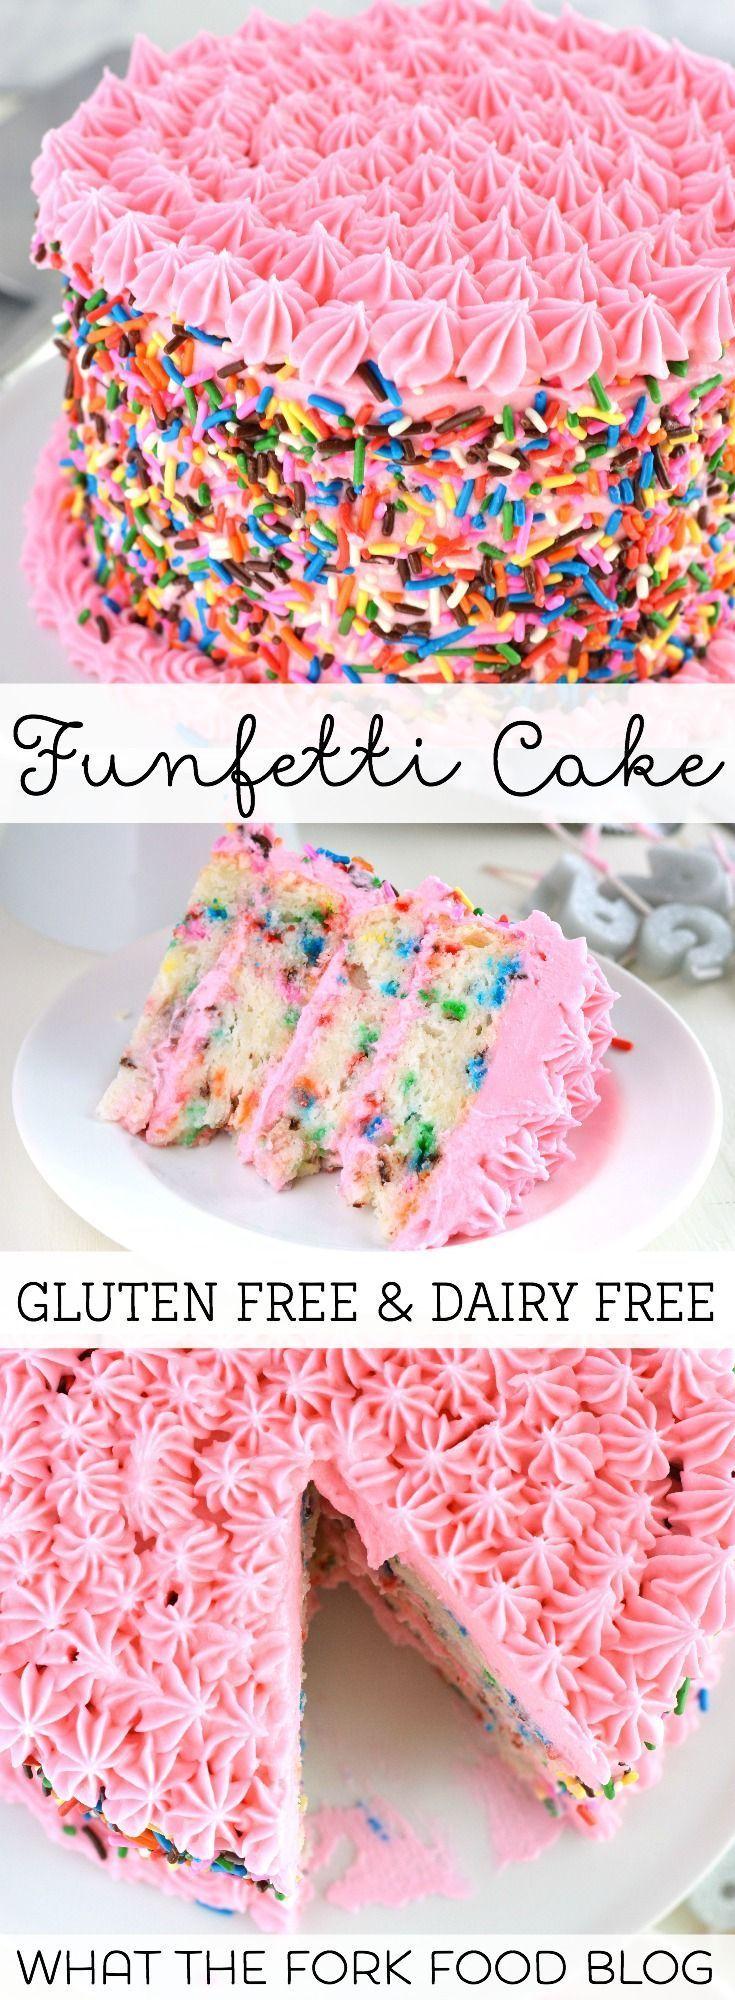 Gluten Free Funfetti Cake from What The Fork Food Blog | @WhatTheForkBlog | http://whattheforkfoodblog.com